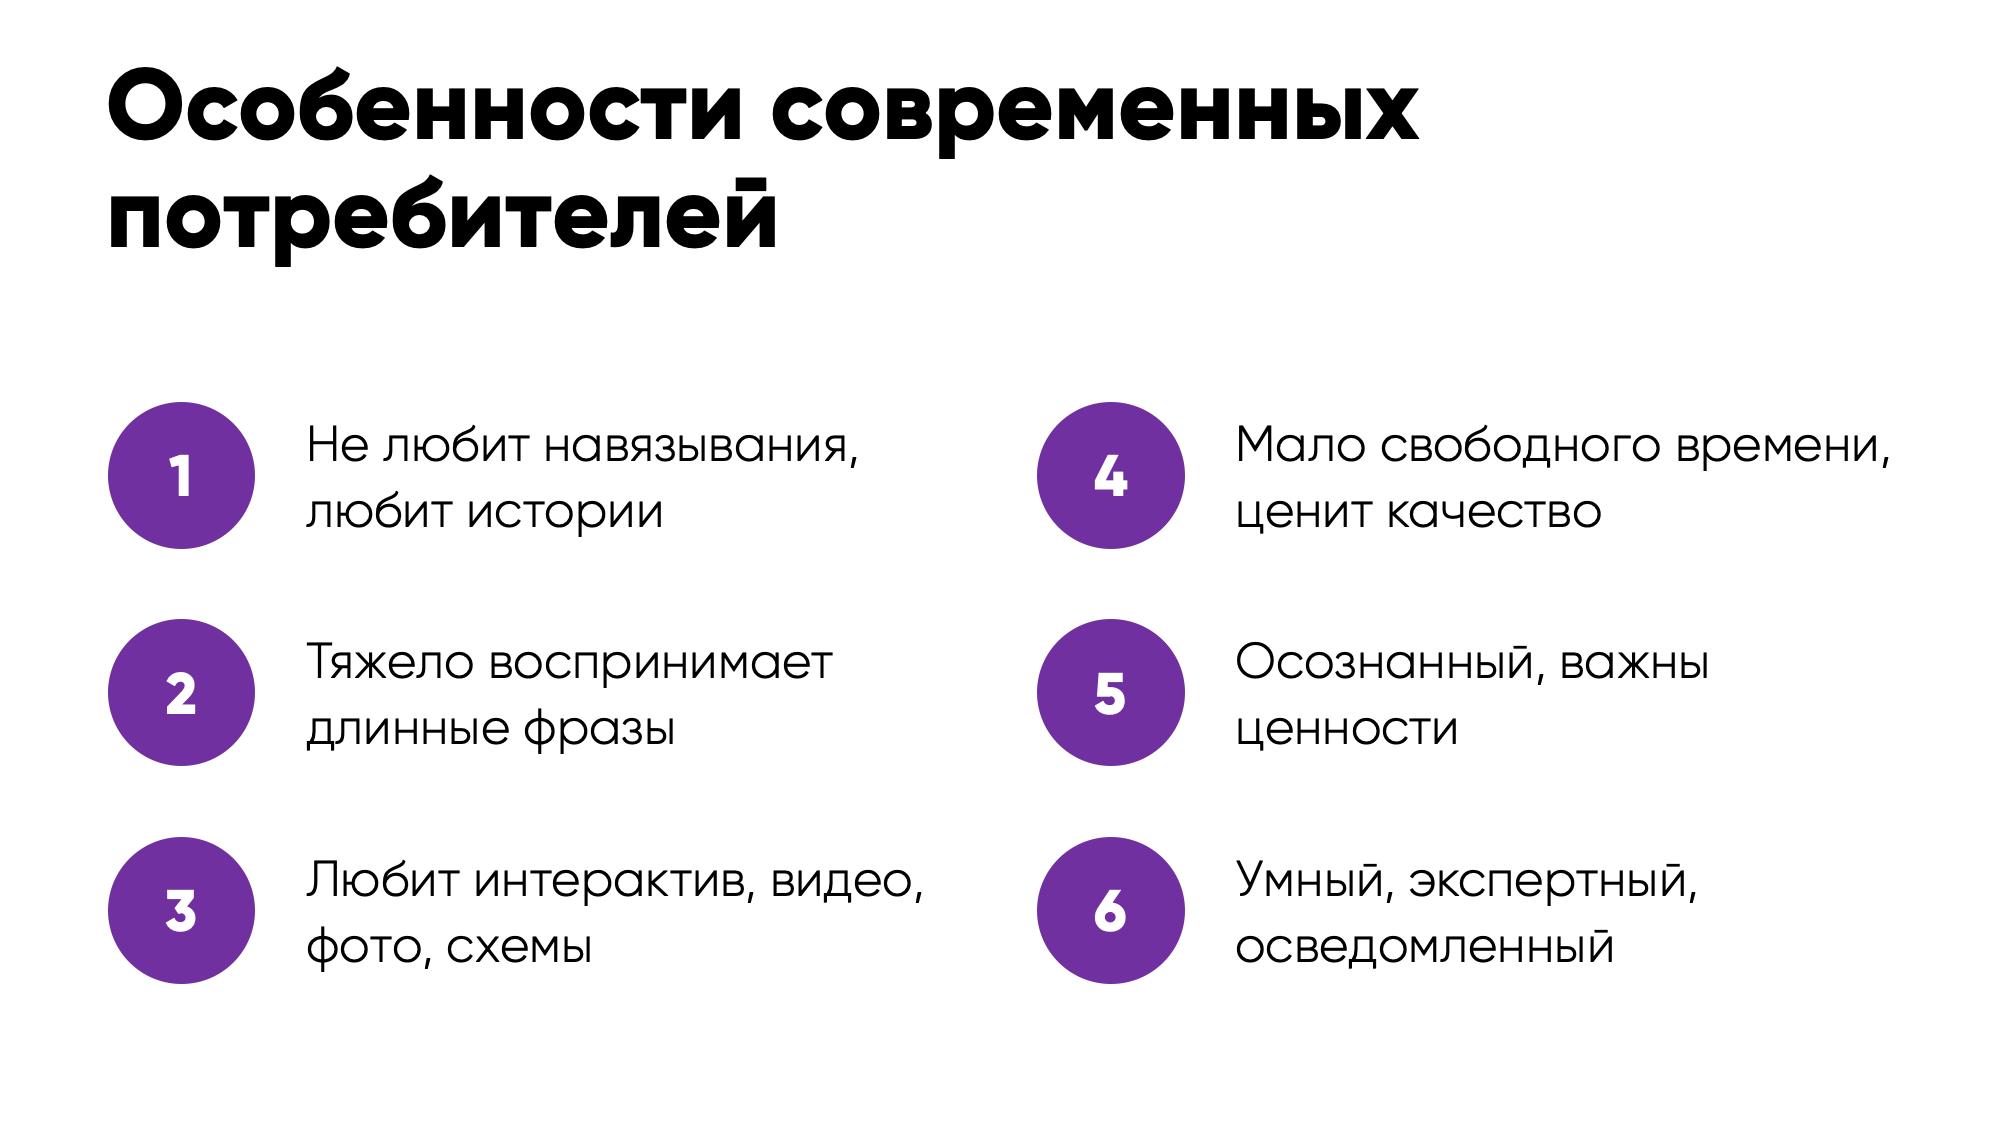 Пример слайда 1